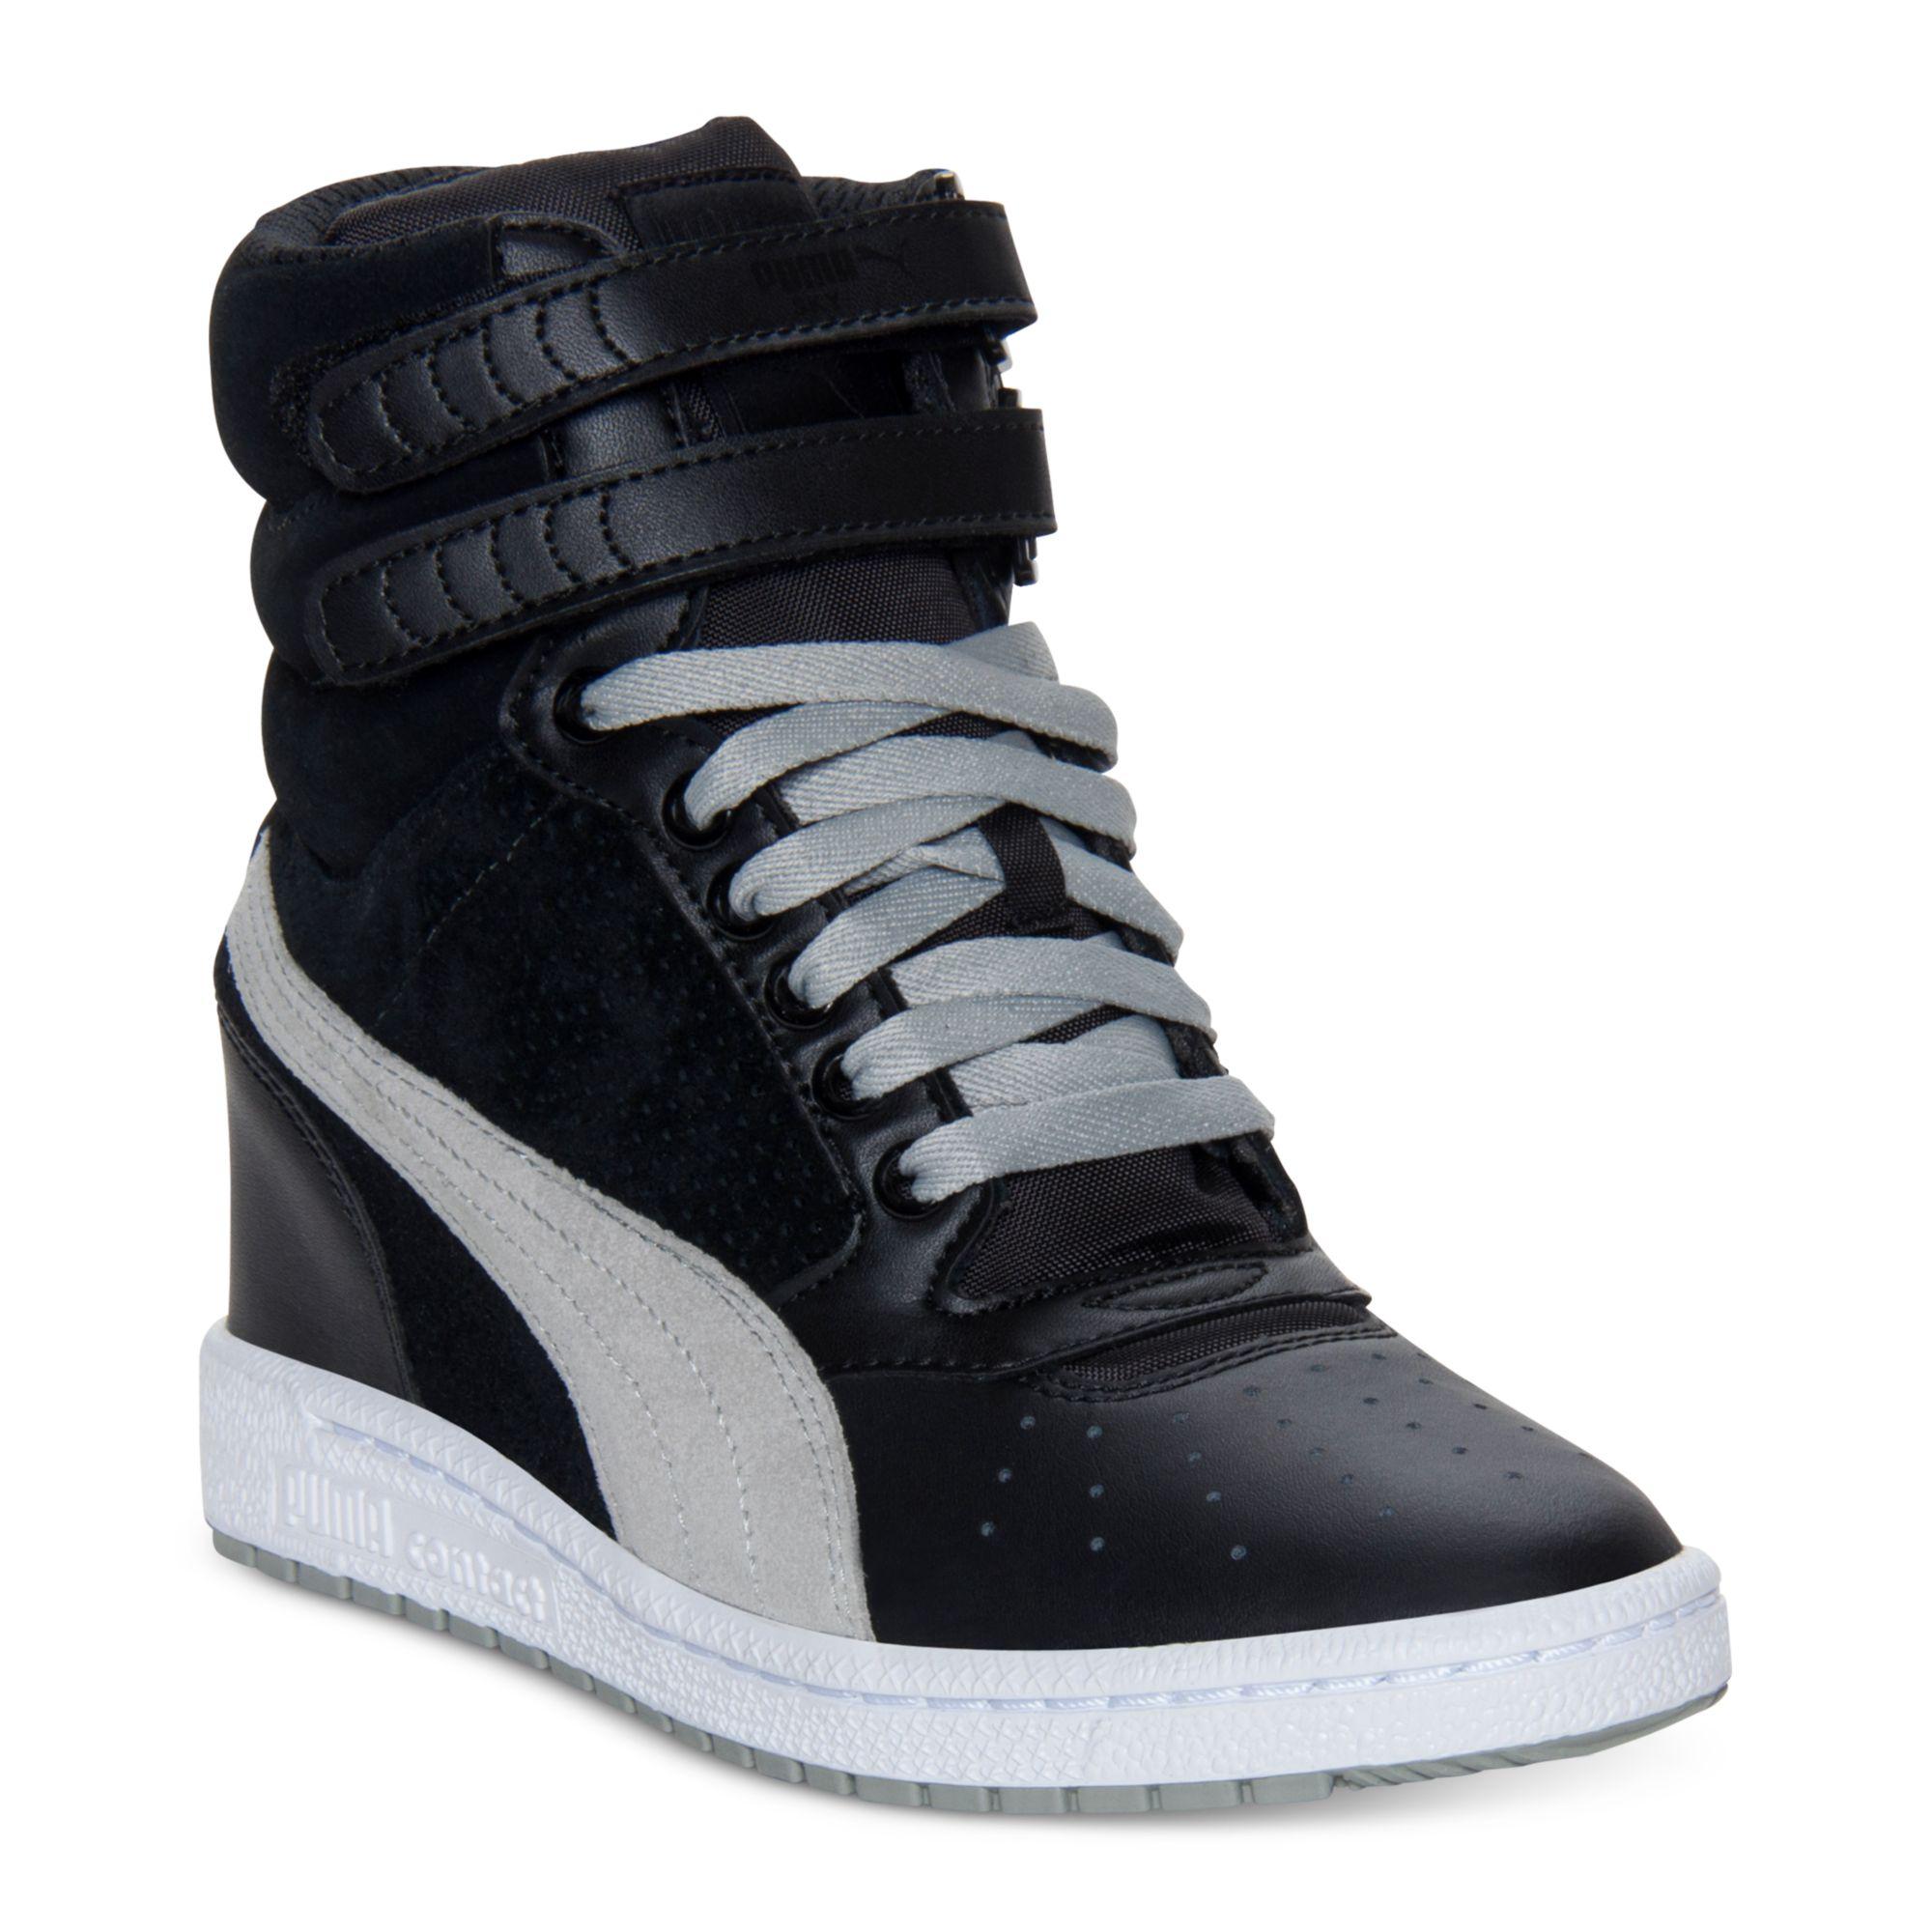 246c74b43f PUMA Sky Wedge Casual Sneakers in Black - Lyst